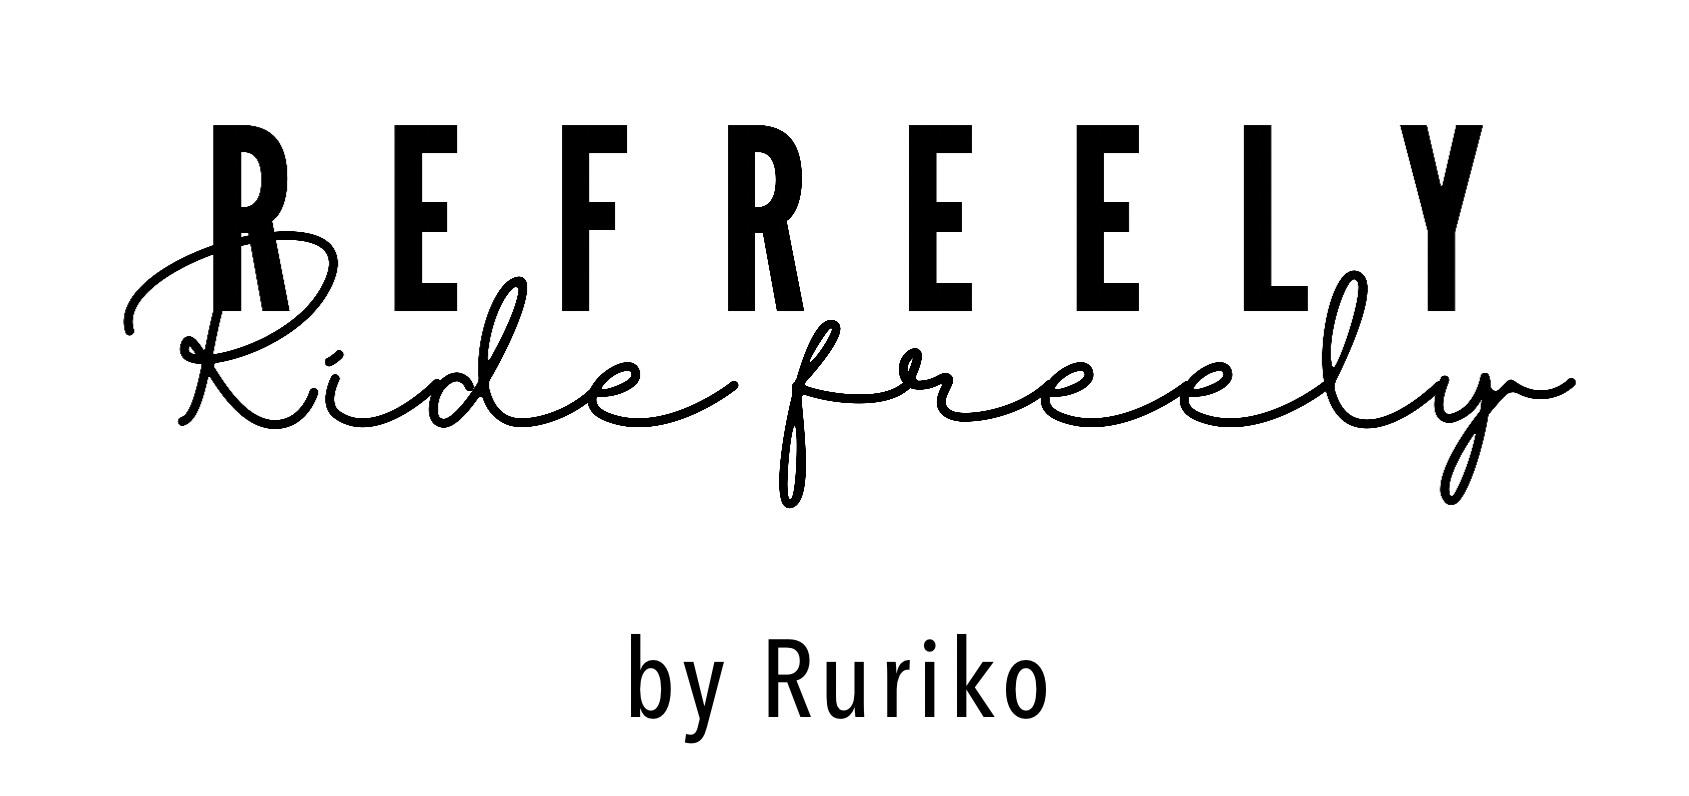 Ruriko's official site